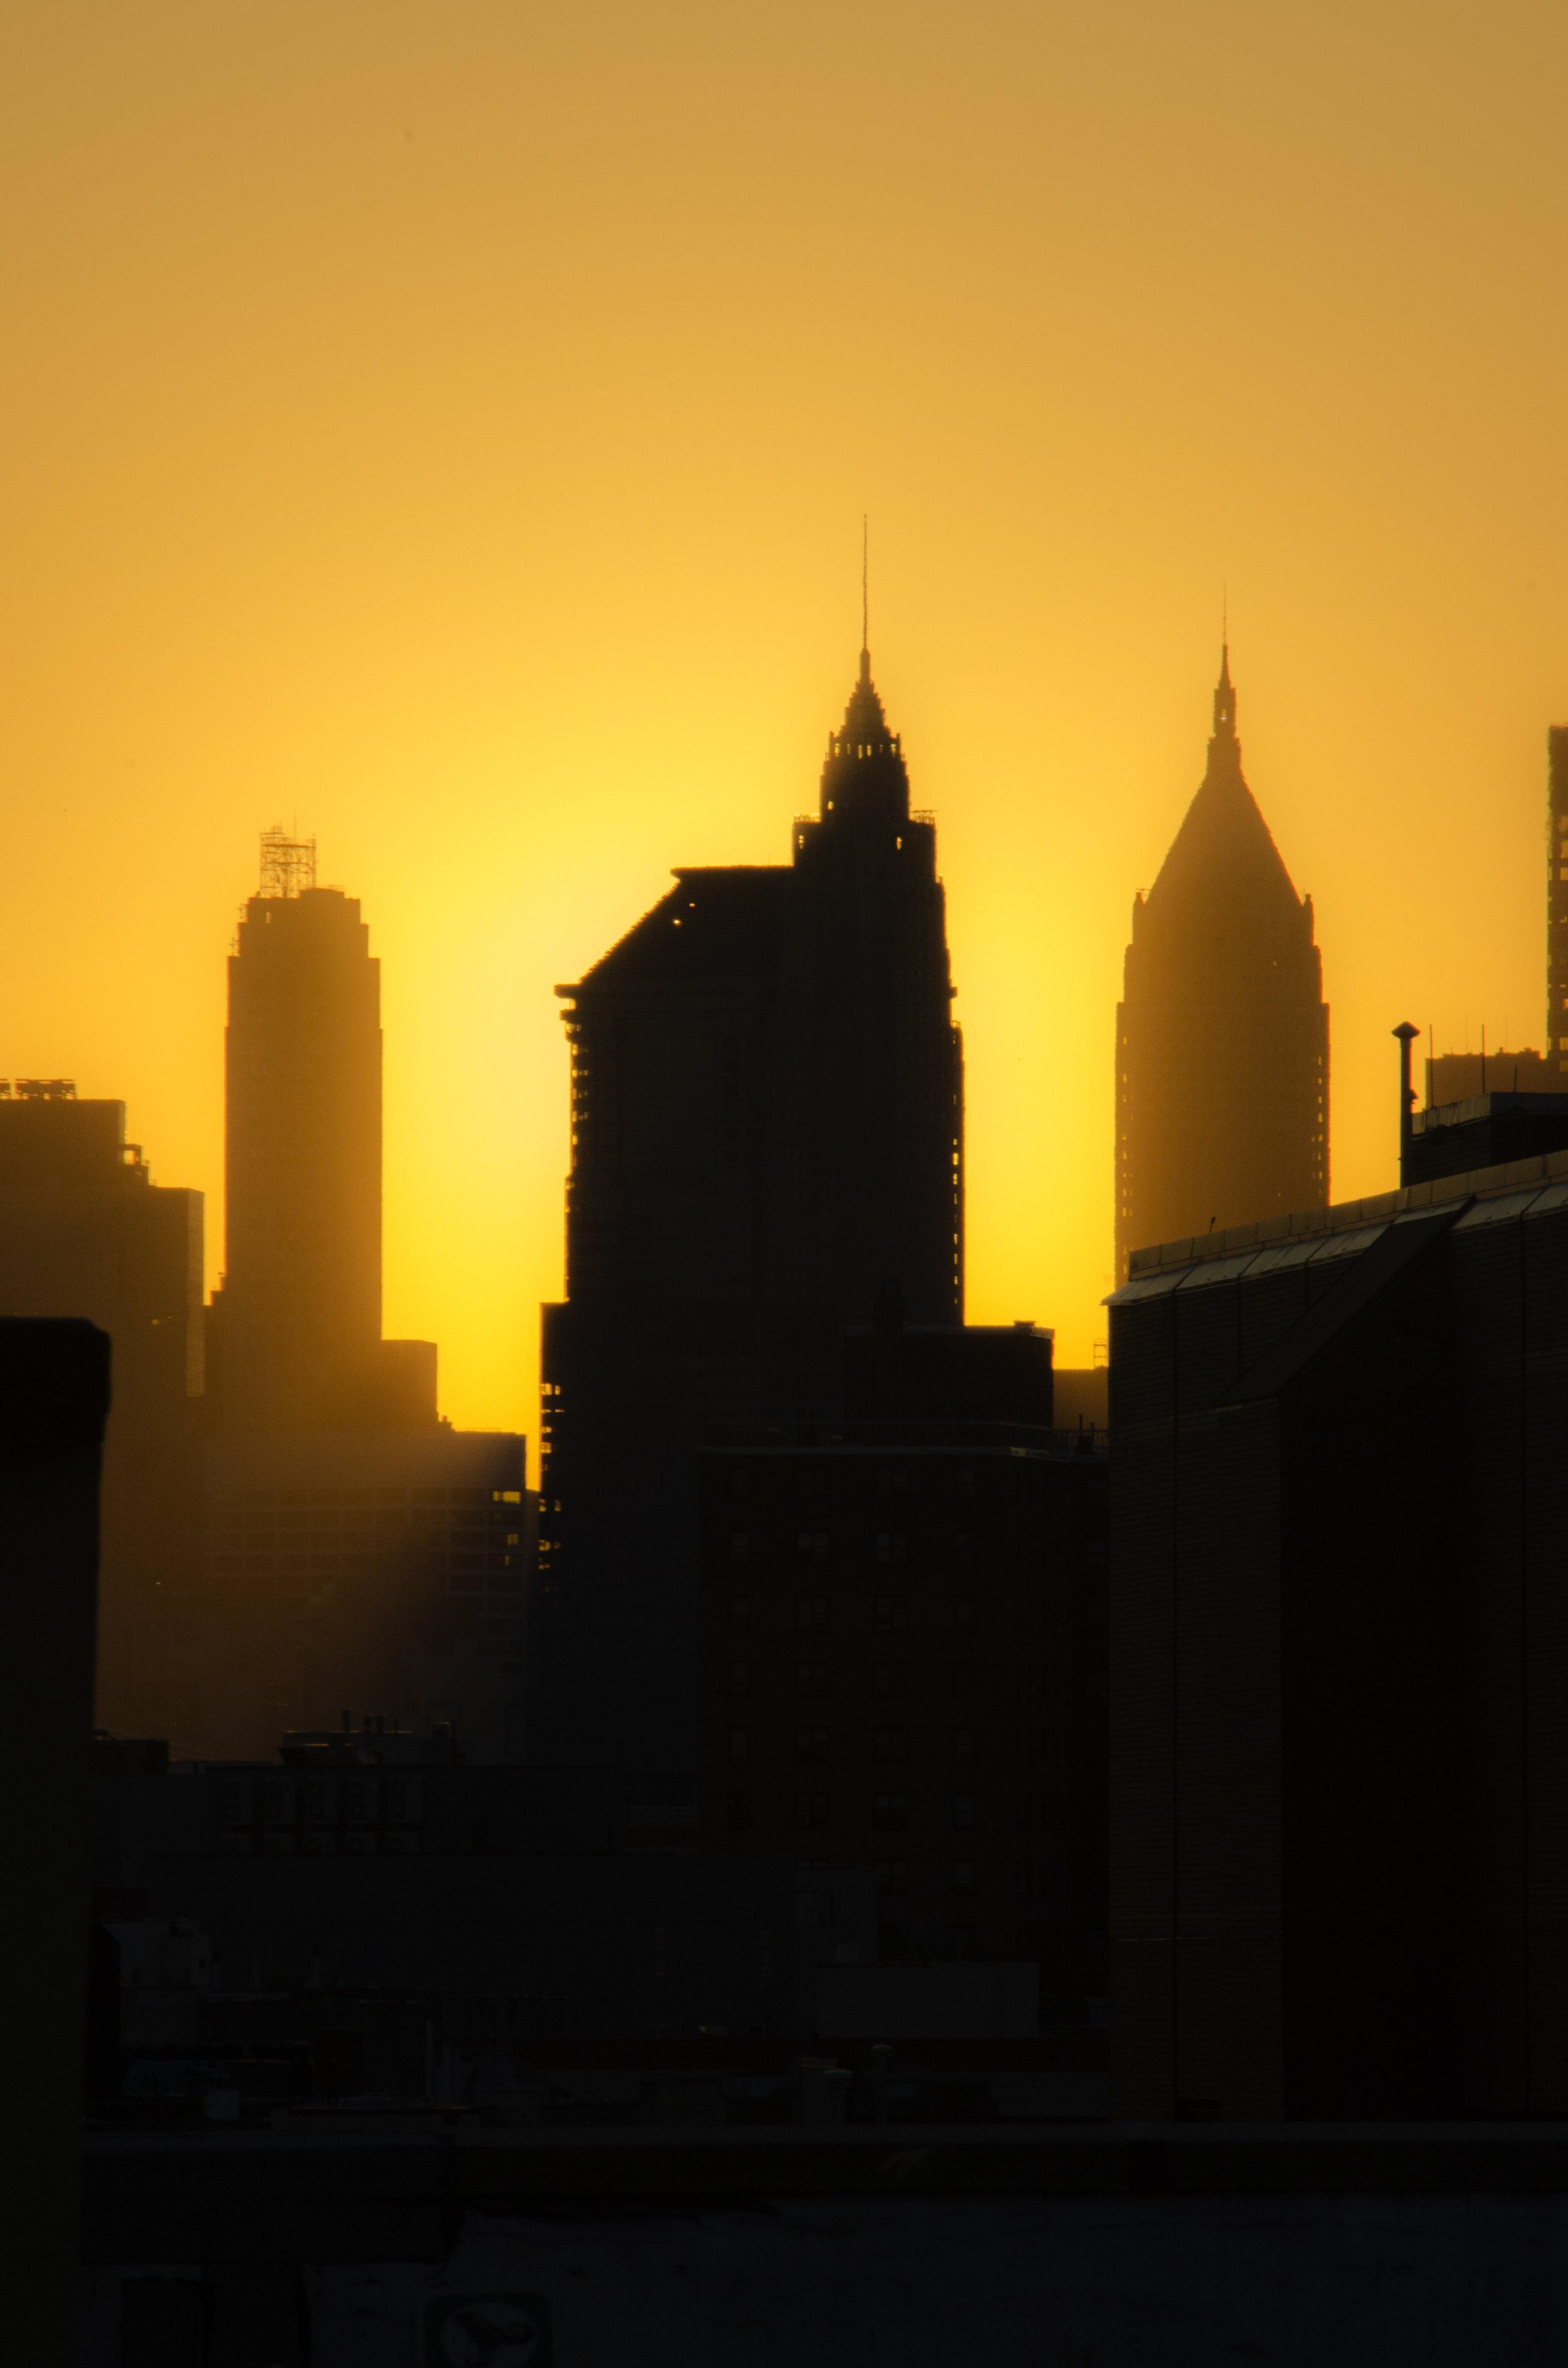 brooklyn-sunset_26471904899_o.jpg